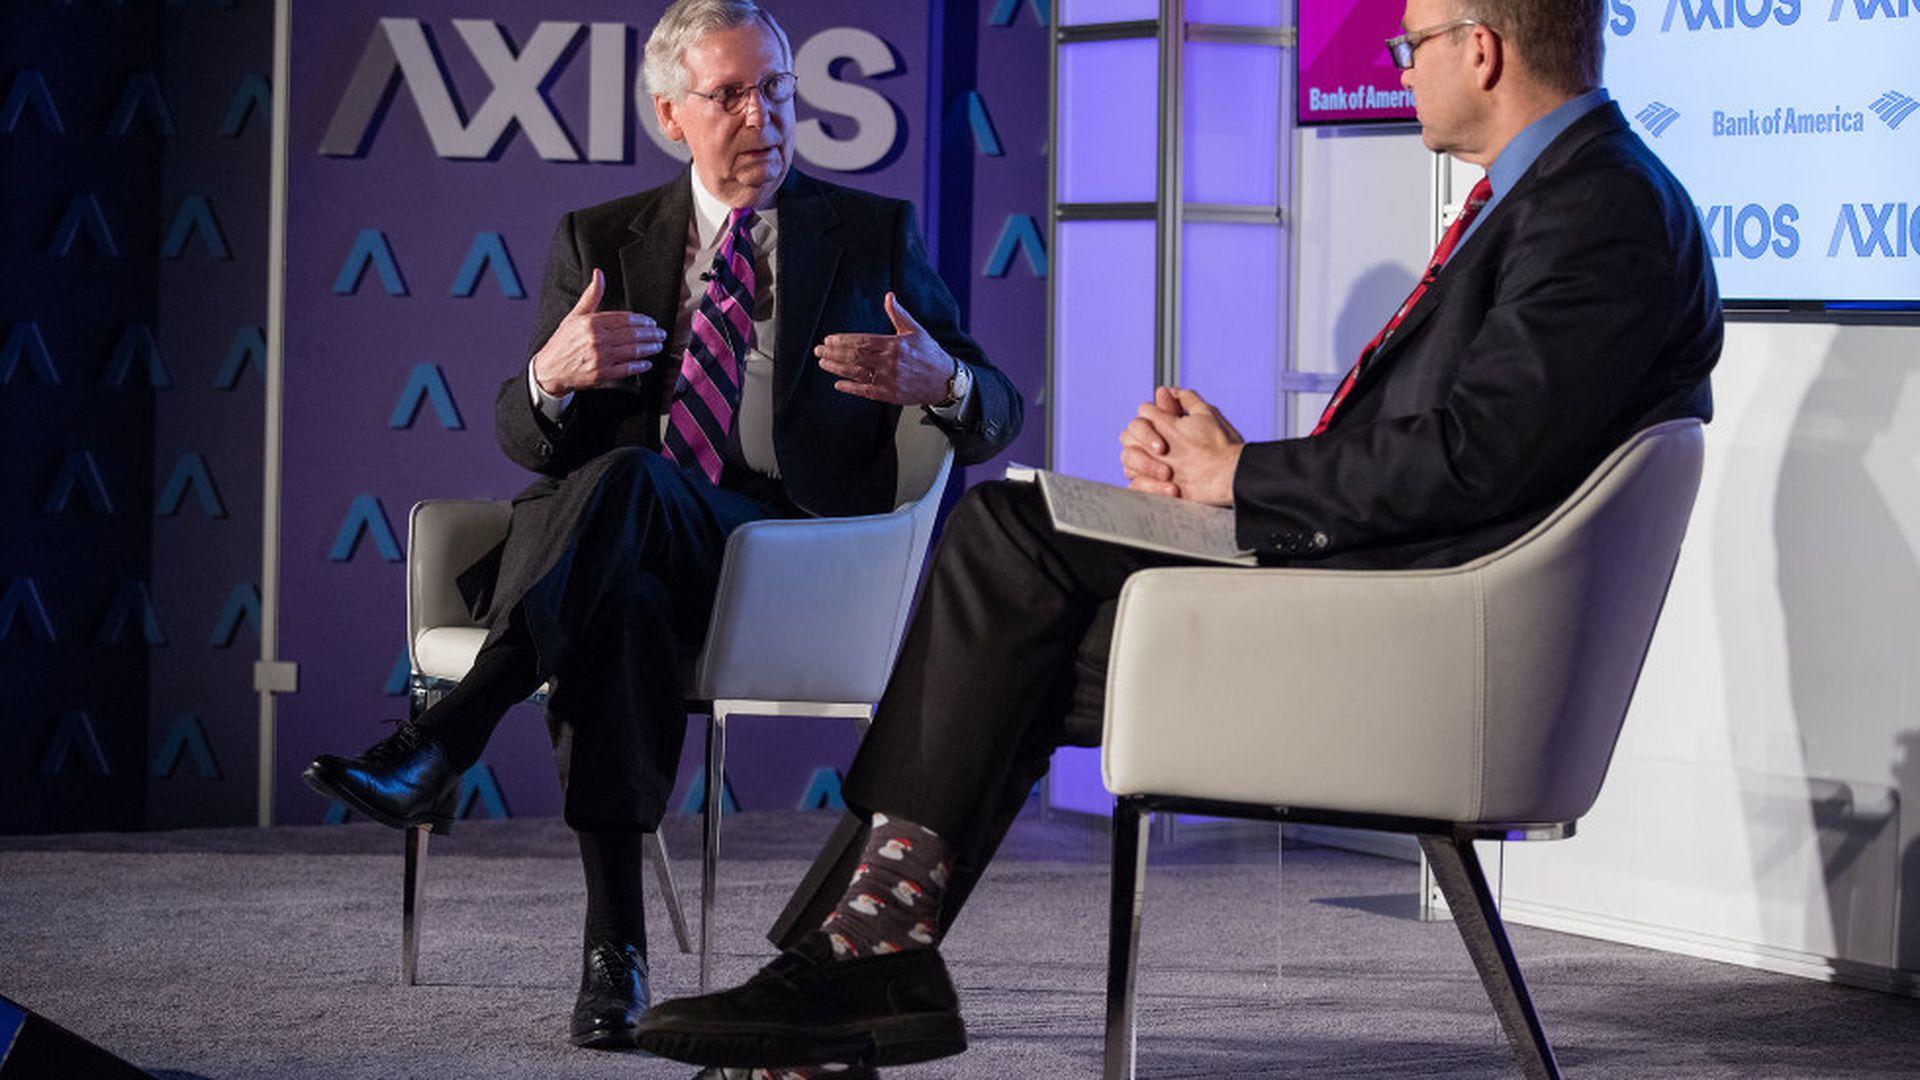 Axios360 News Shapers: Senate Majority Leader Mitch McConnell & Senator  Mark Warner